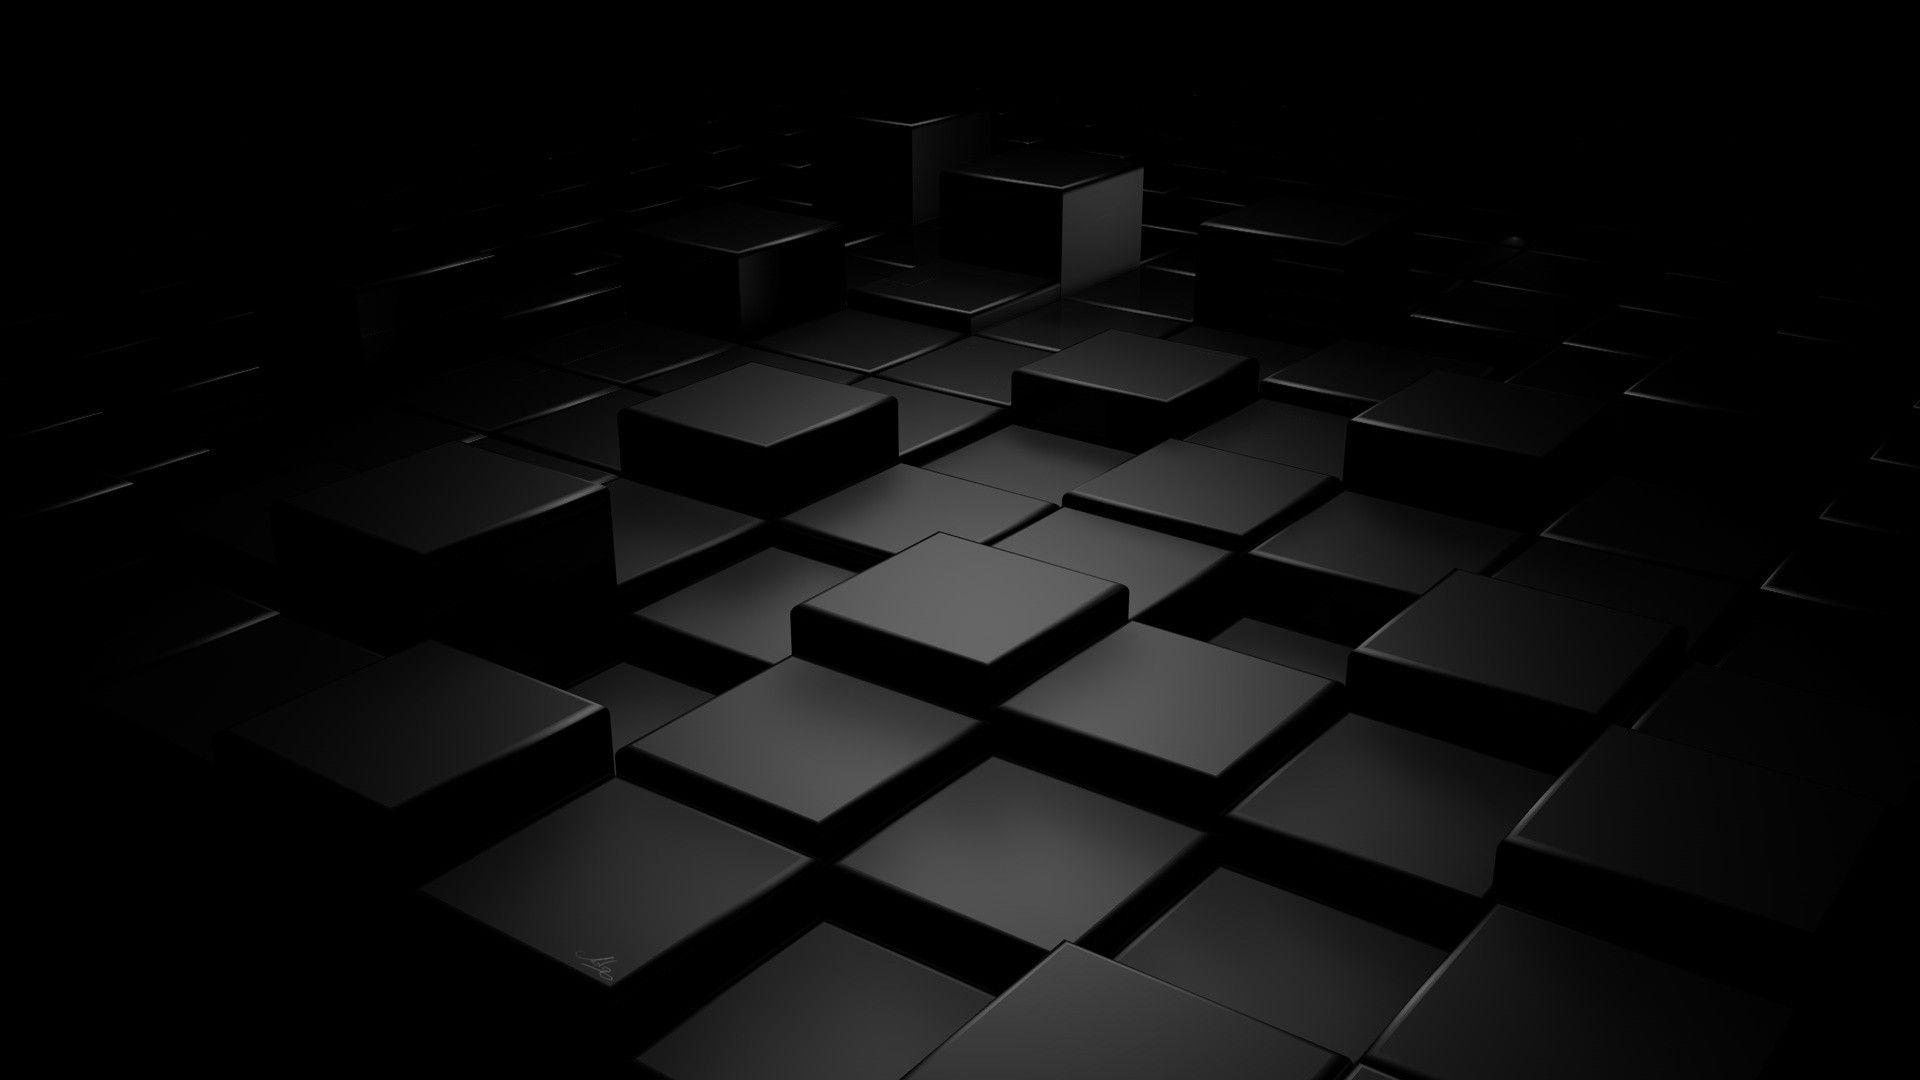 Geometry Dark Abstract Render Cube Digital Art Wallpaper Black Hd Wallpaper Black Wallpaper Android Wallpaper Black